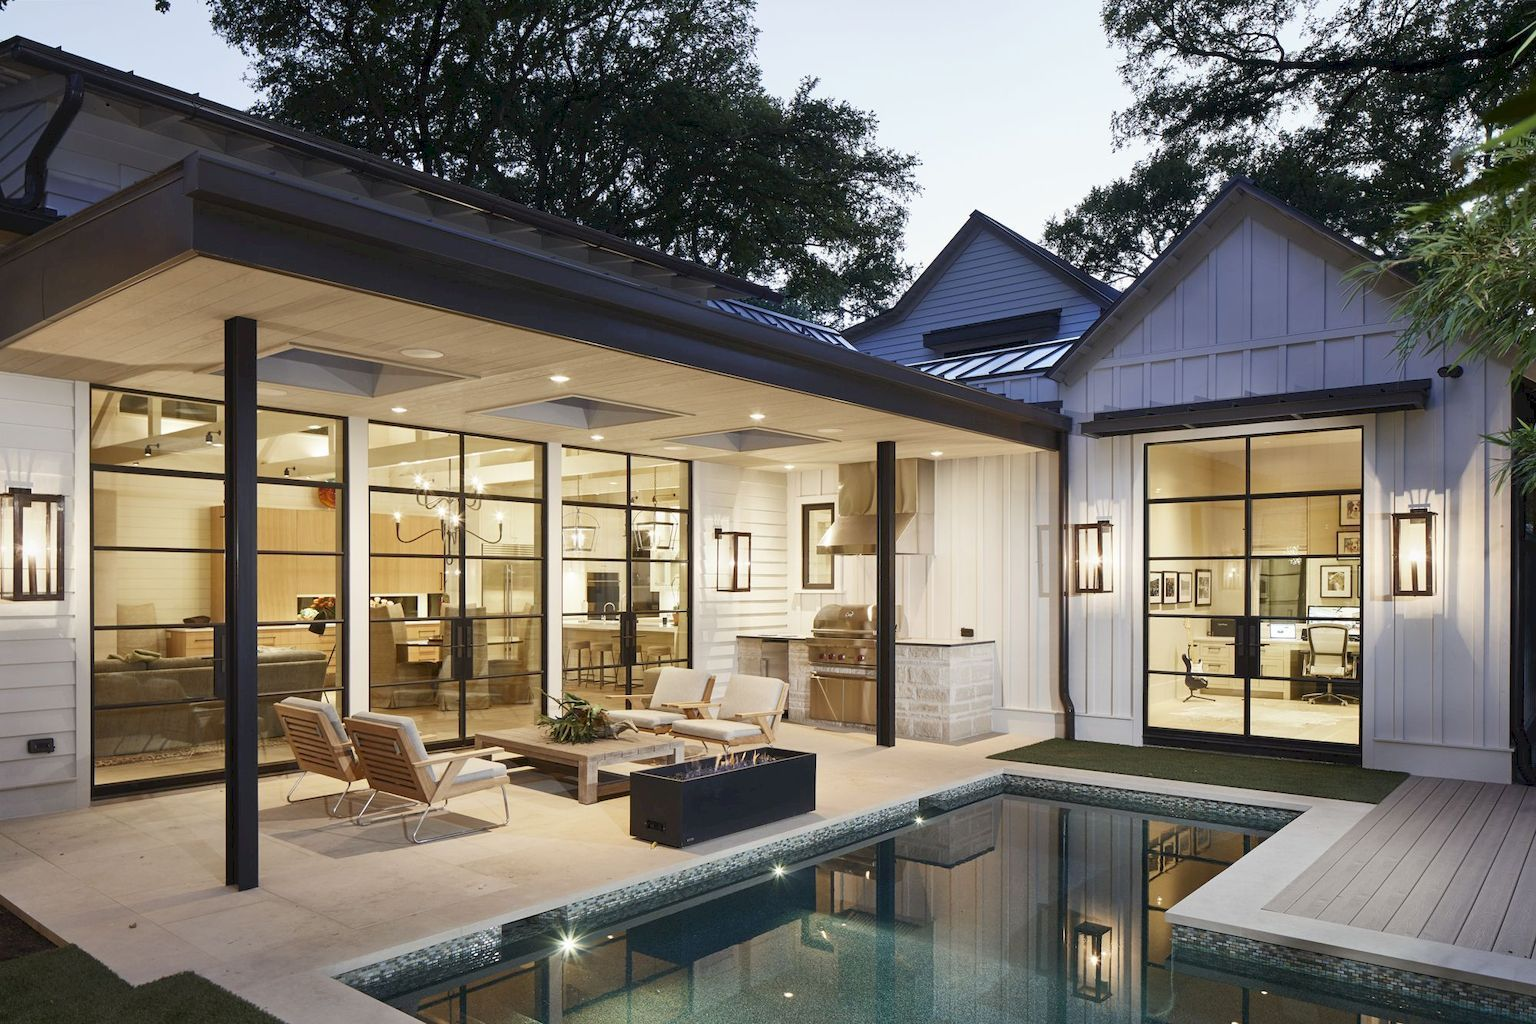 80 Farmhouse Modern Exterior Design Ideas Dream Home